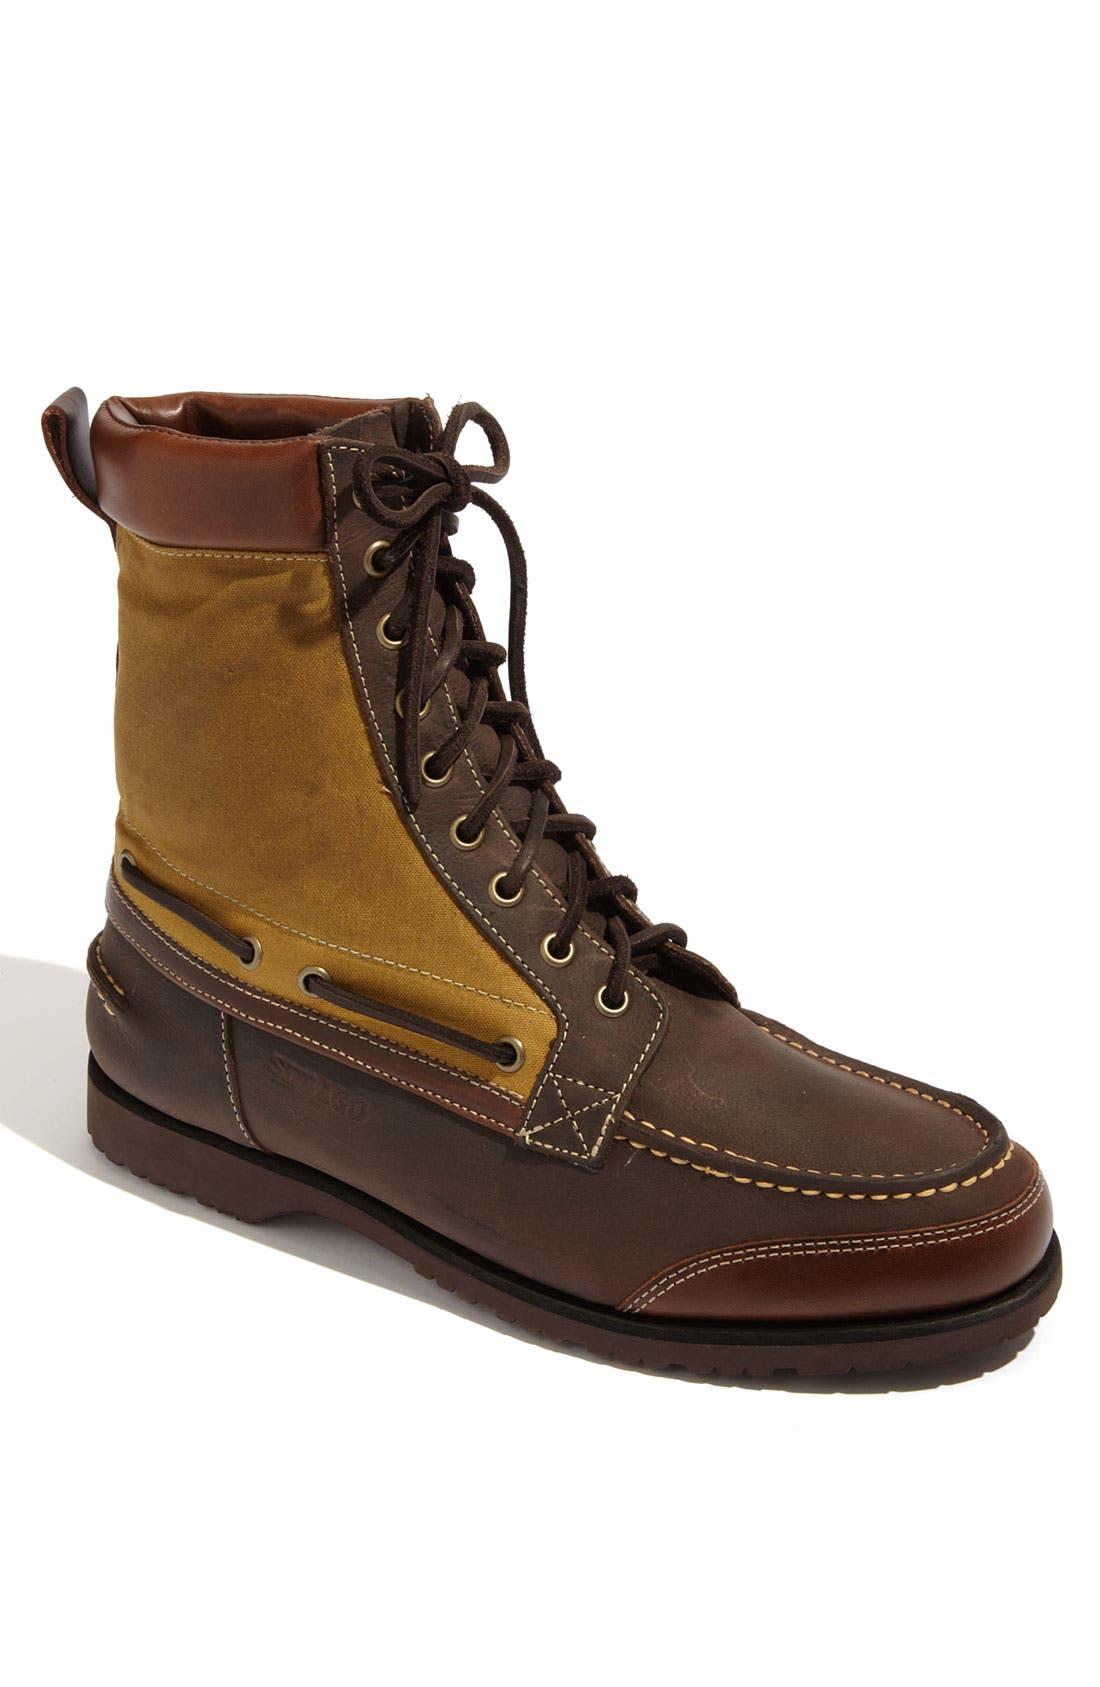 SEBAGO,                             'Osmore' Boot,                             Main thumbnail 1, color,                             200